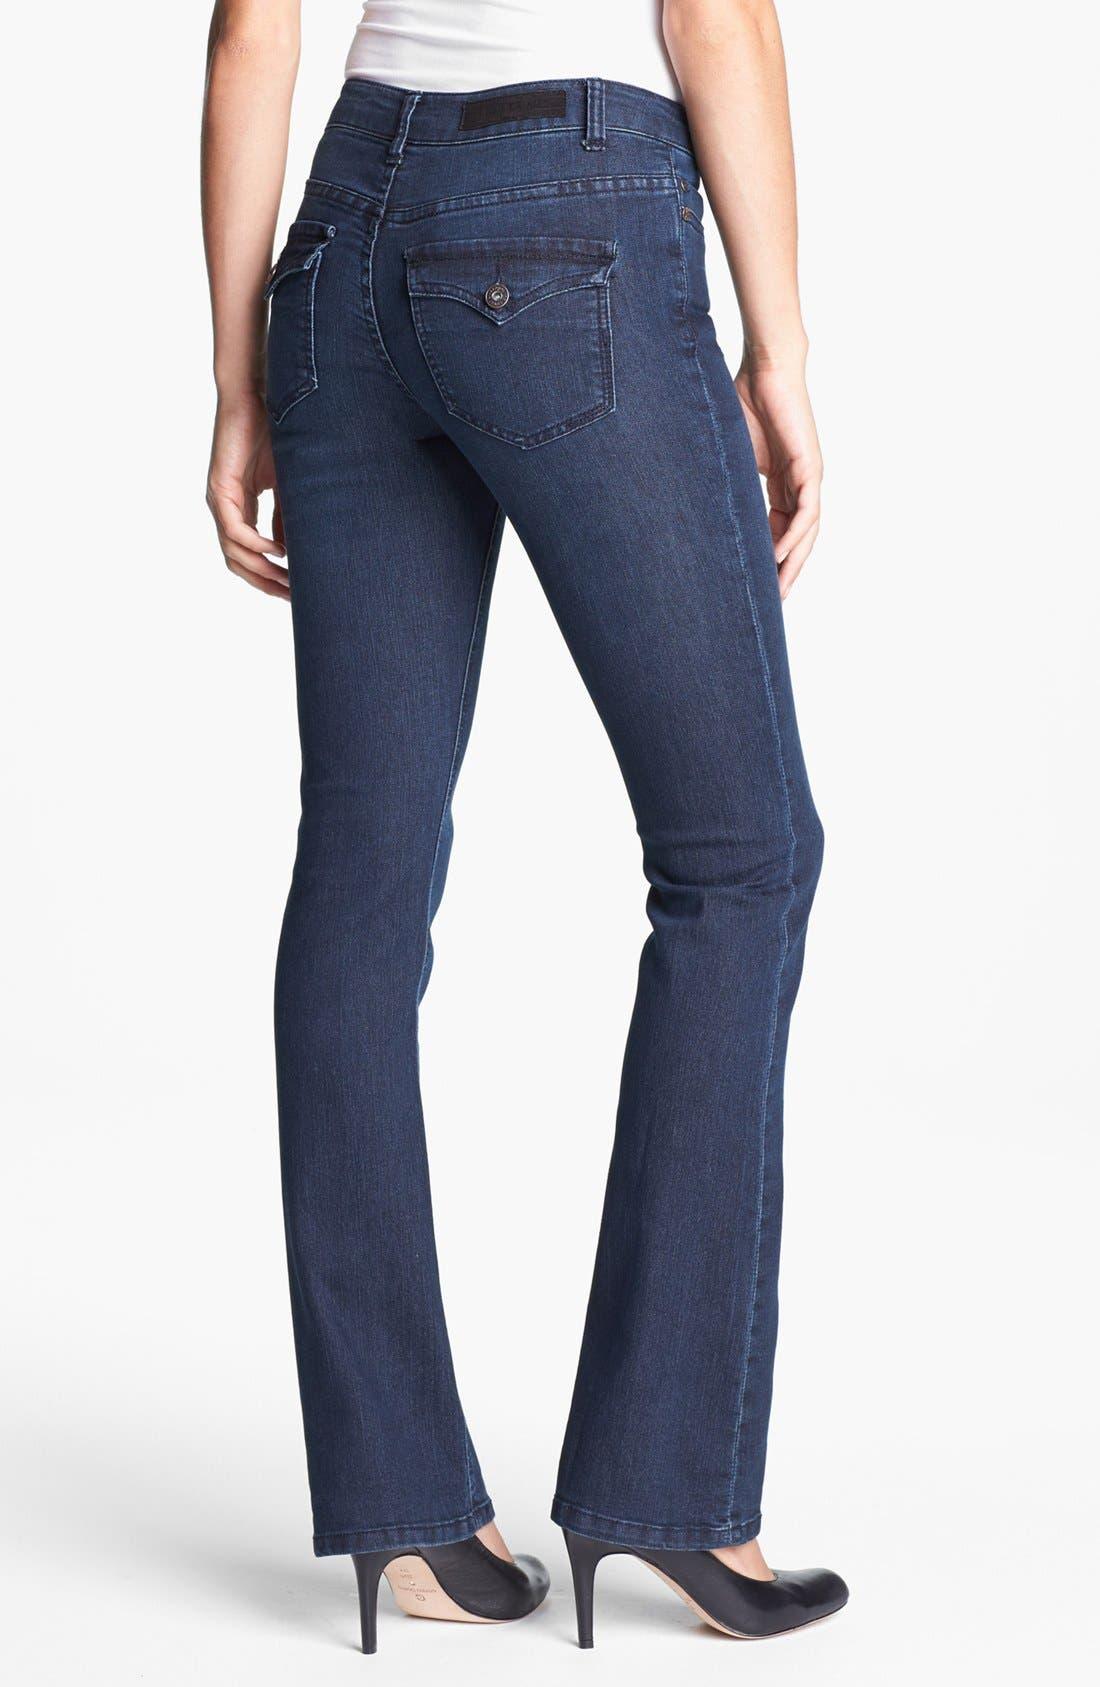 Alternate Image 2  - Liverpool Jeans Company 'Rita' Bootcut Stretch Jeans (Petite)